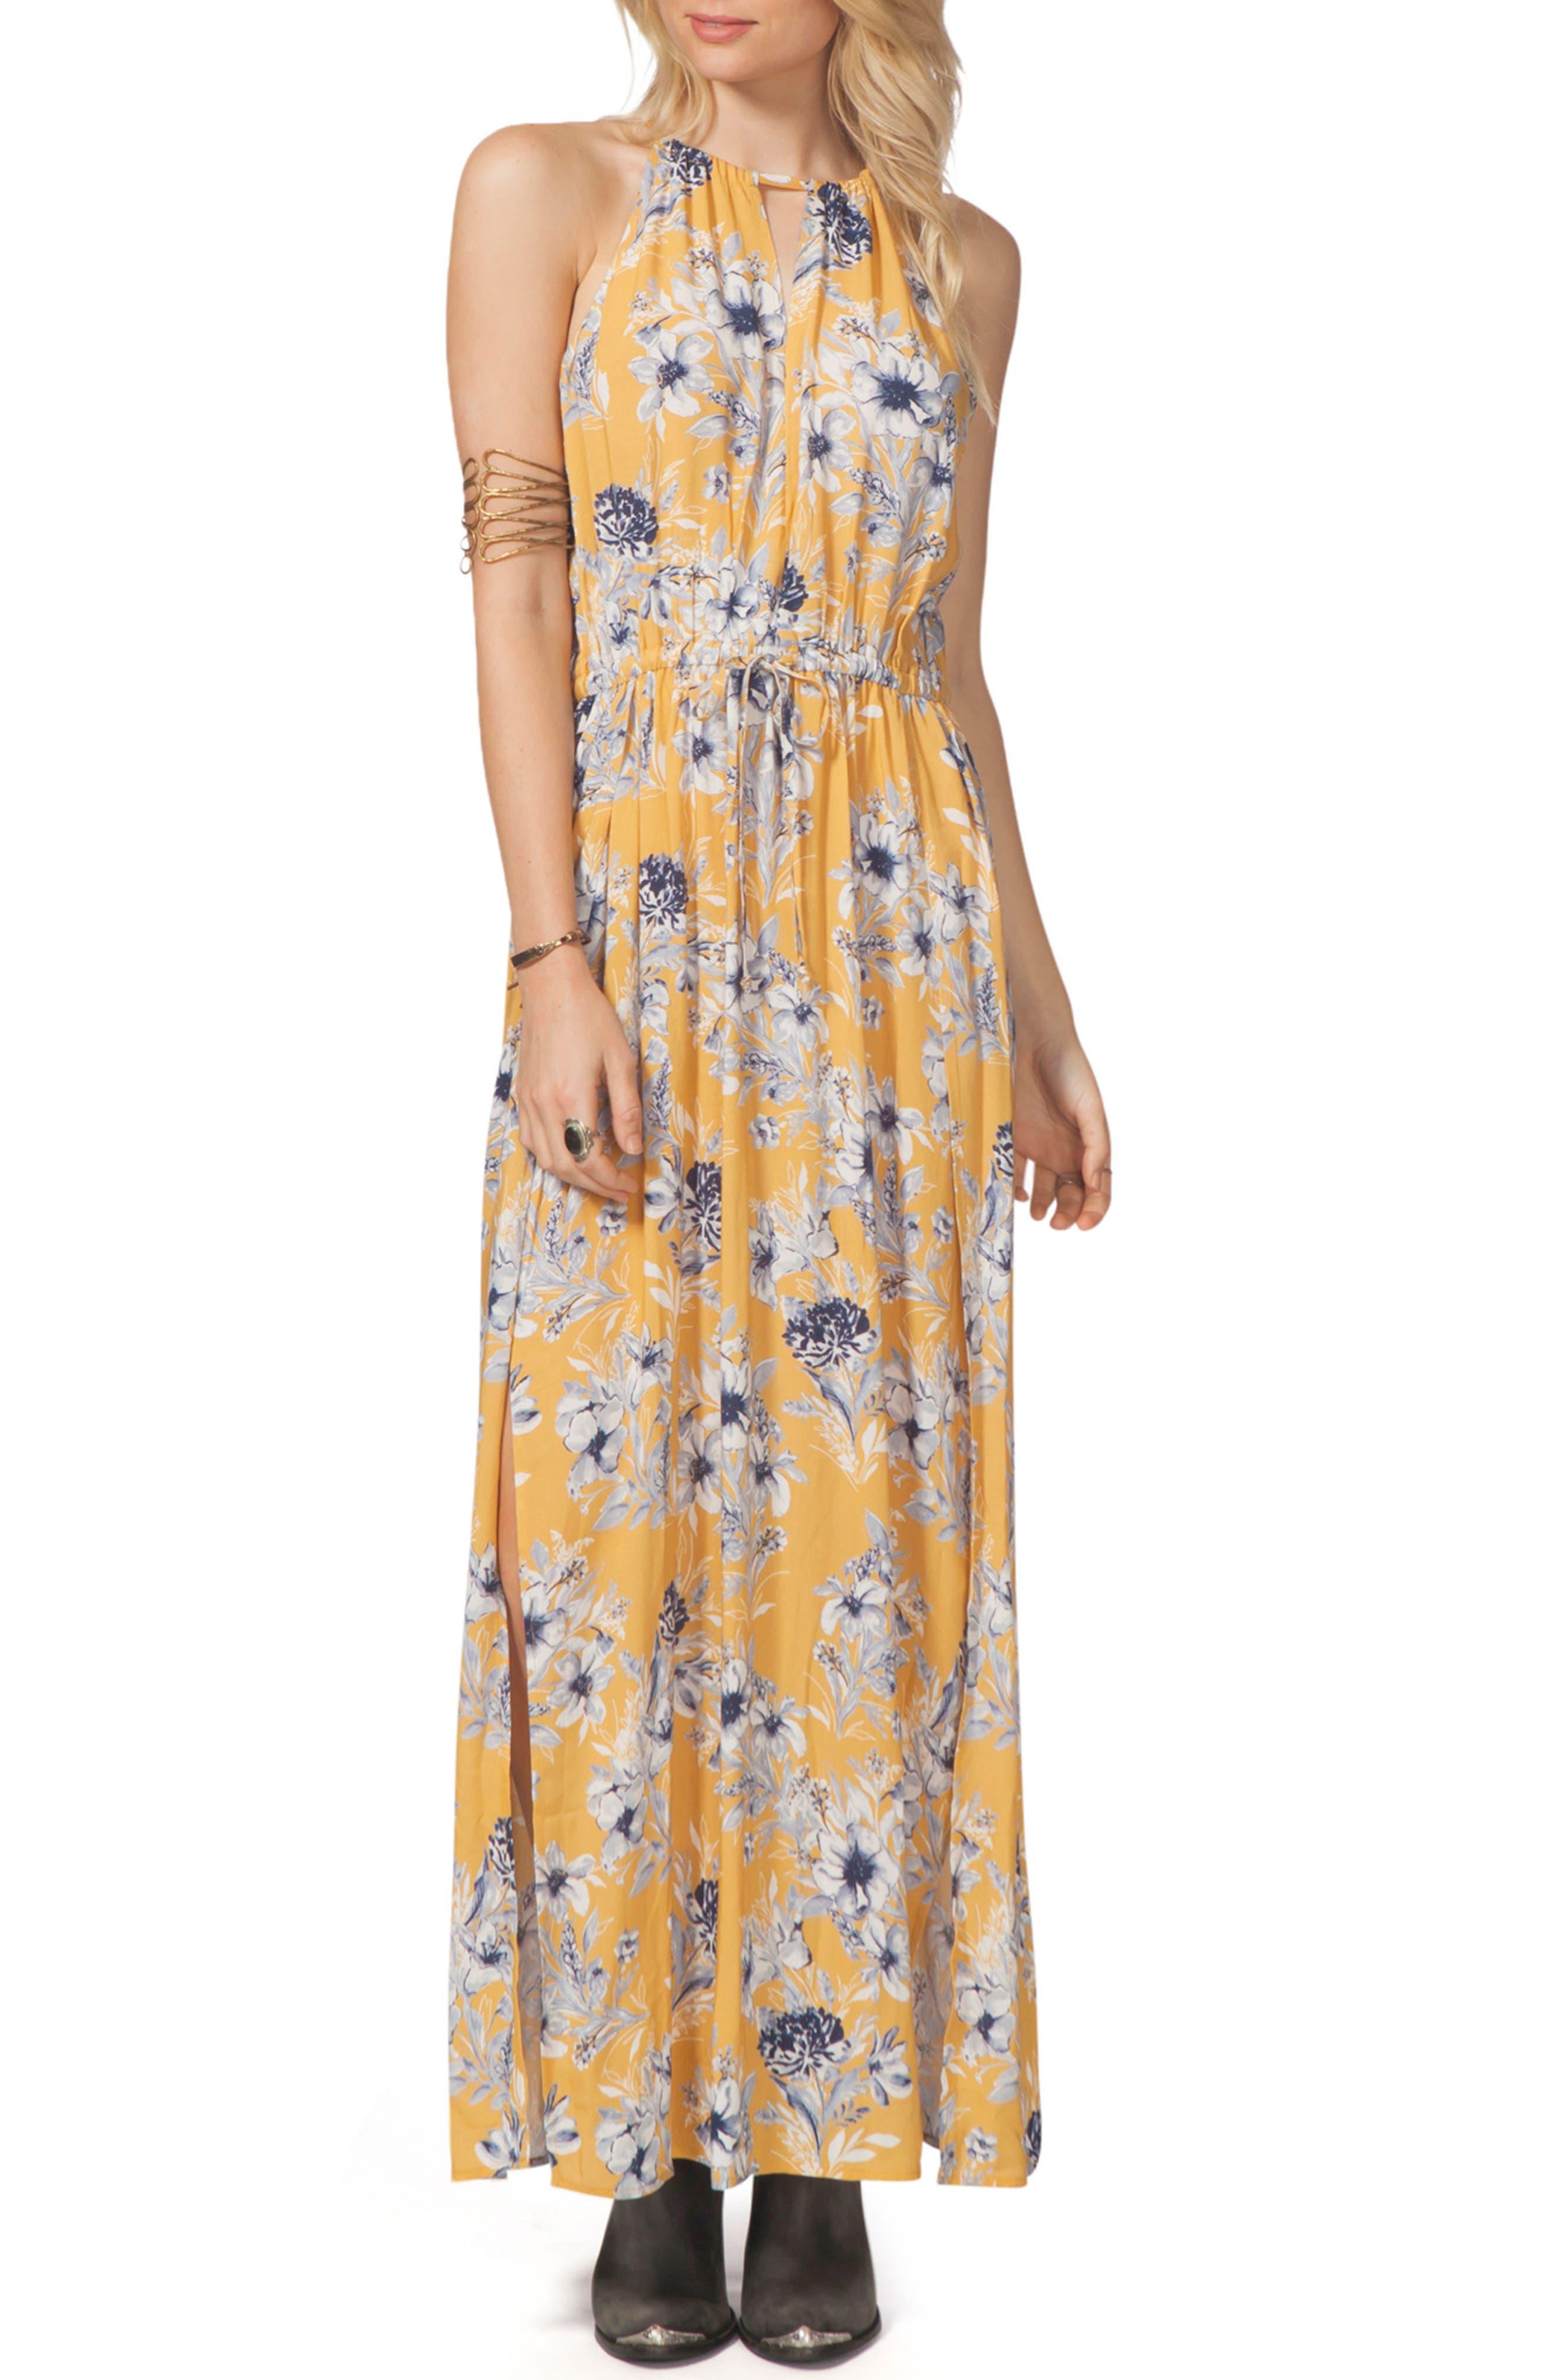 Lovely Day Maxi Dress,                             Main thumbnail 1, color,                             700